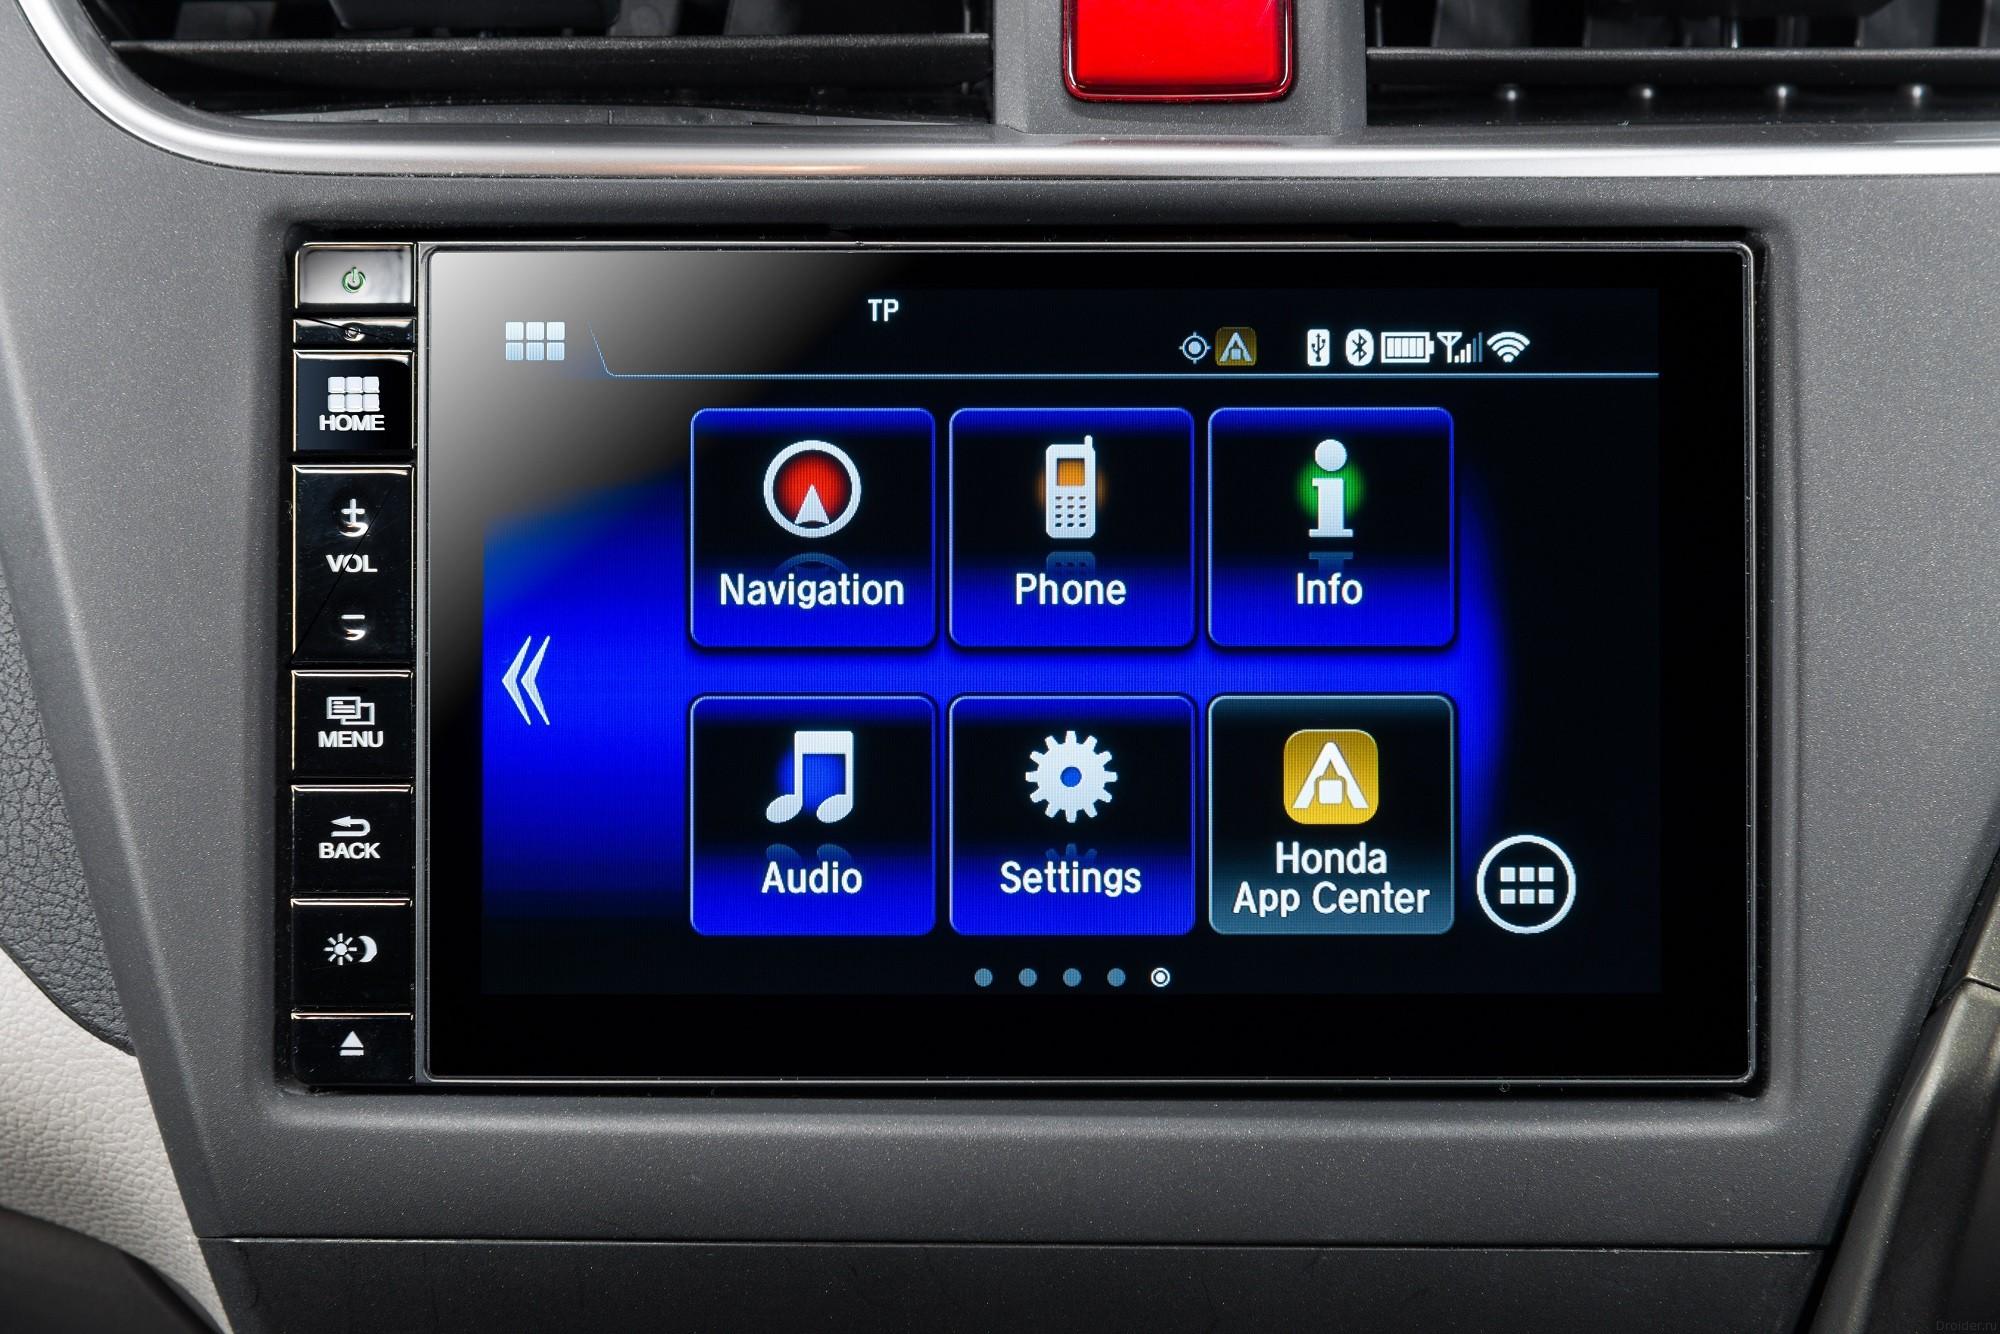 Система Honda Connect для авто на базе чипа Tegra и ОС Android